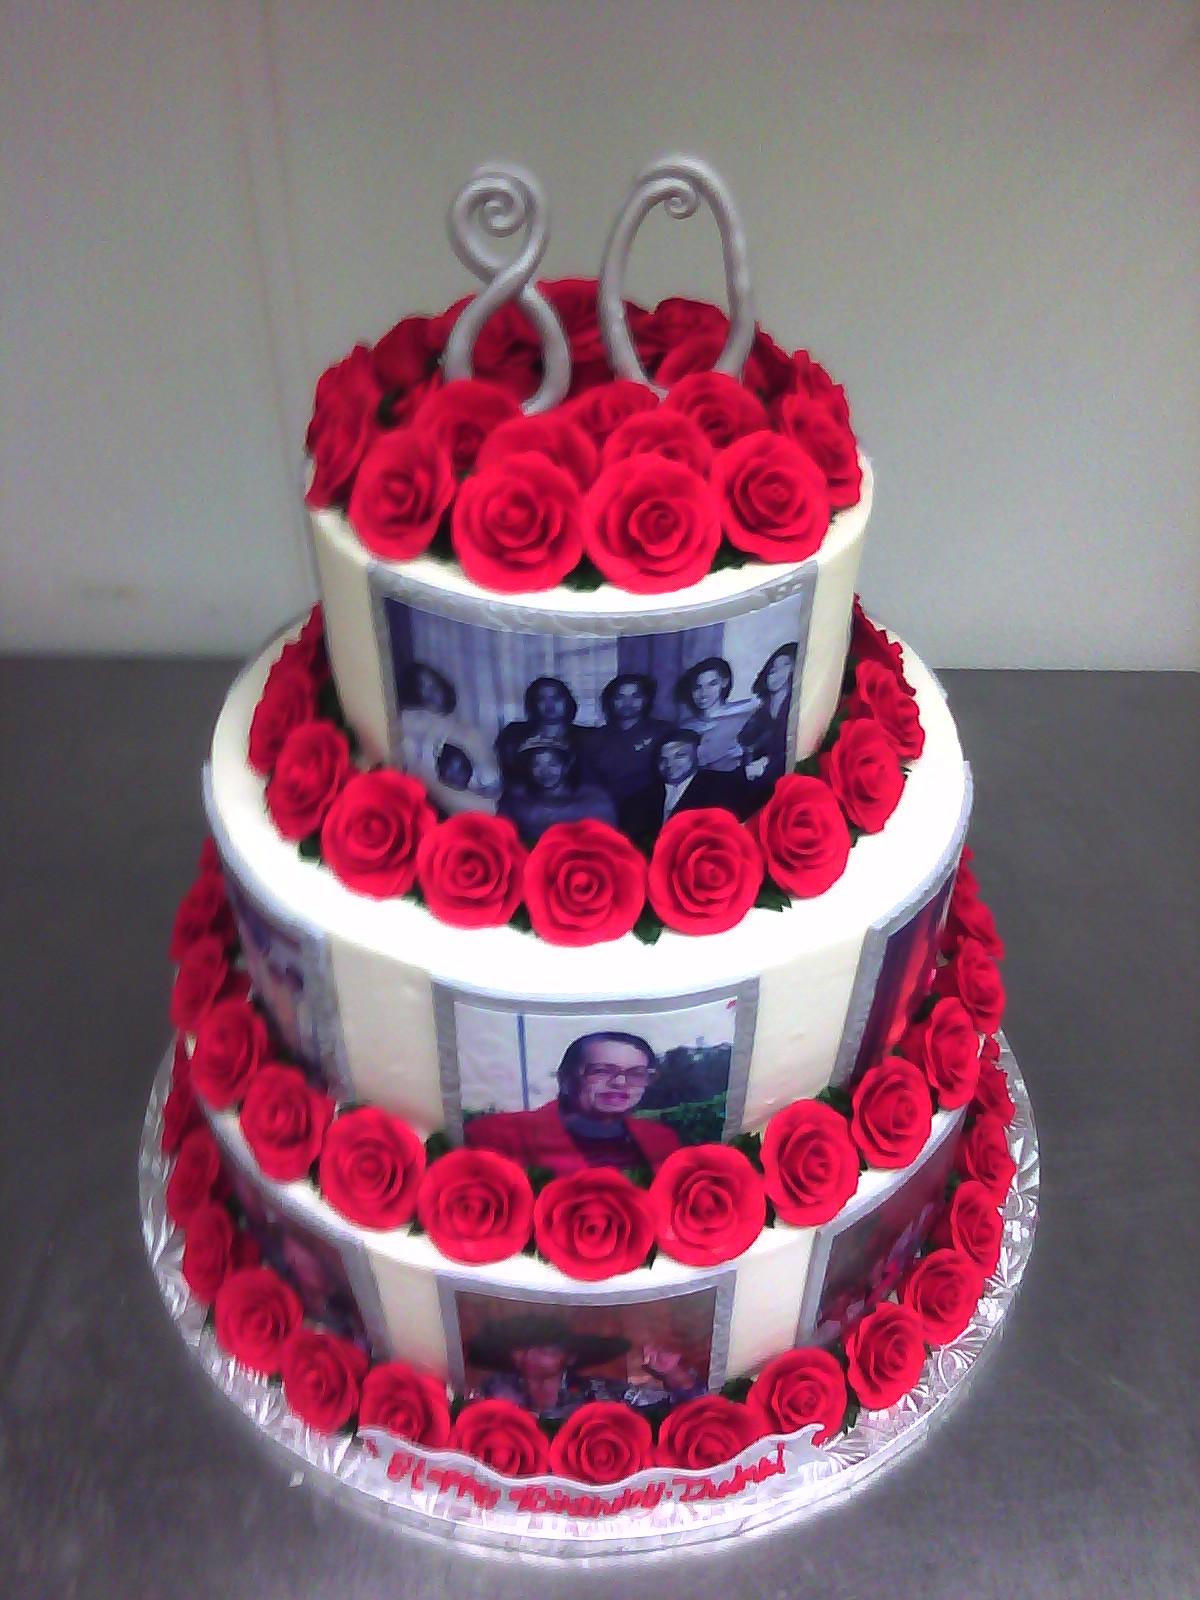 11 Birthday Cakes For 80th Birthday Photo 80th Birthday Cake Ideas